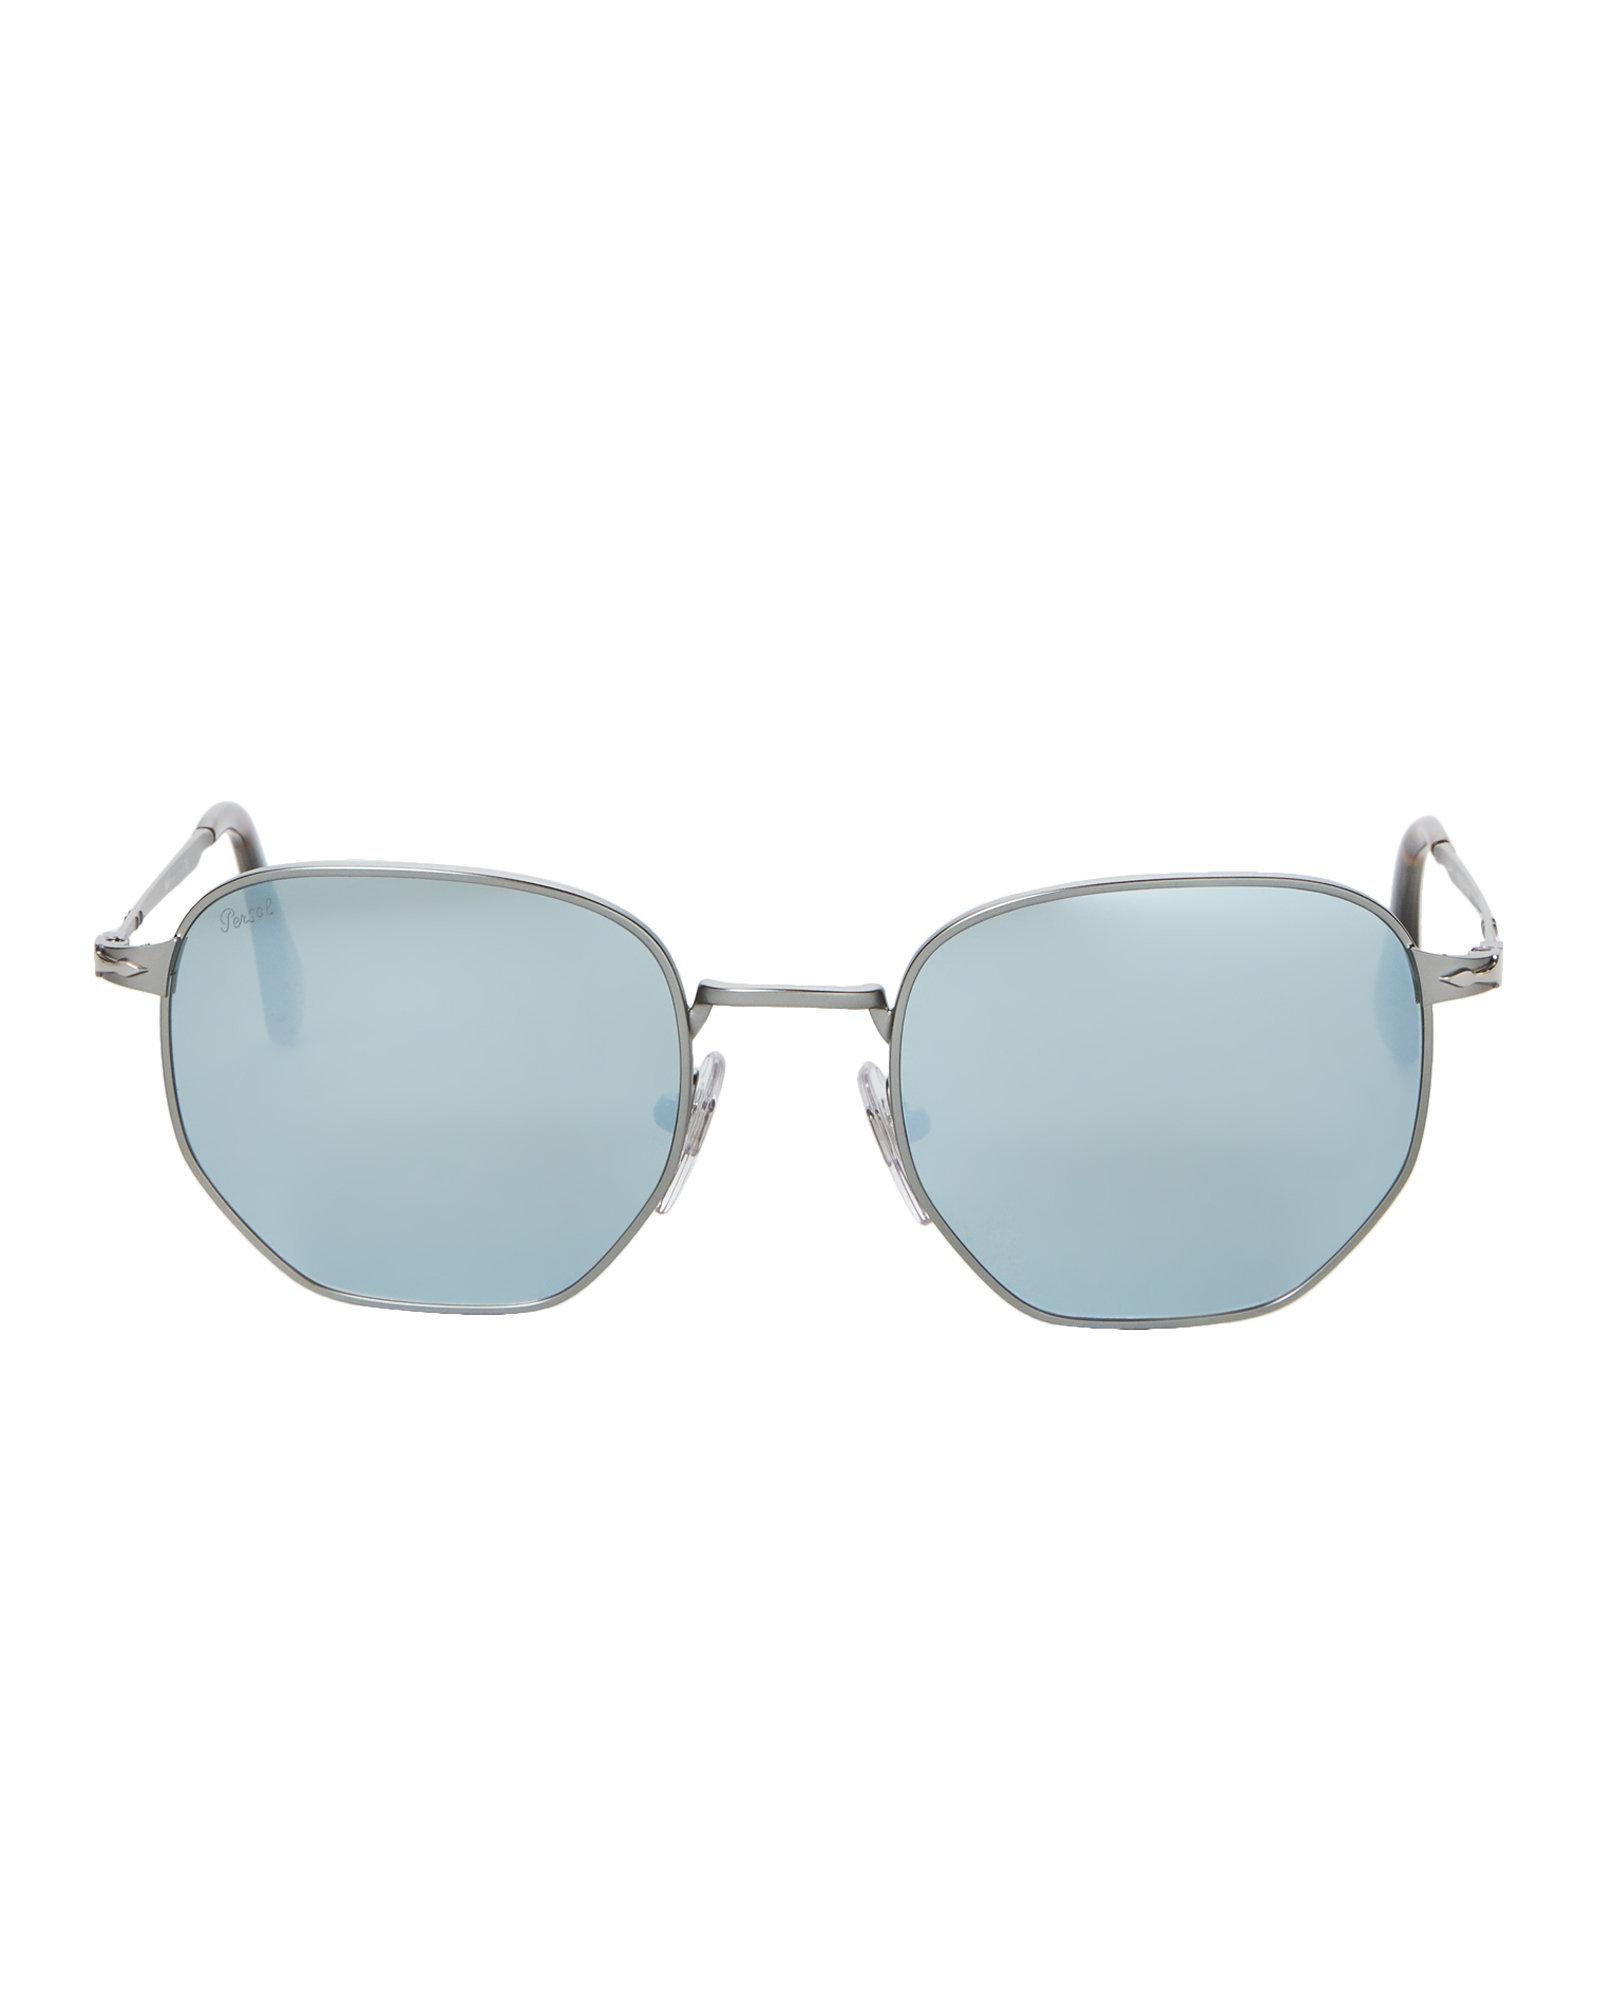 Men Mirror Black Hexagon Persol Gunmetal amp; Sunglasses Po2446s For Lyst PFw7zq